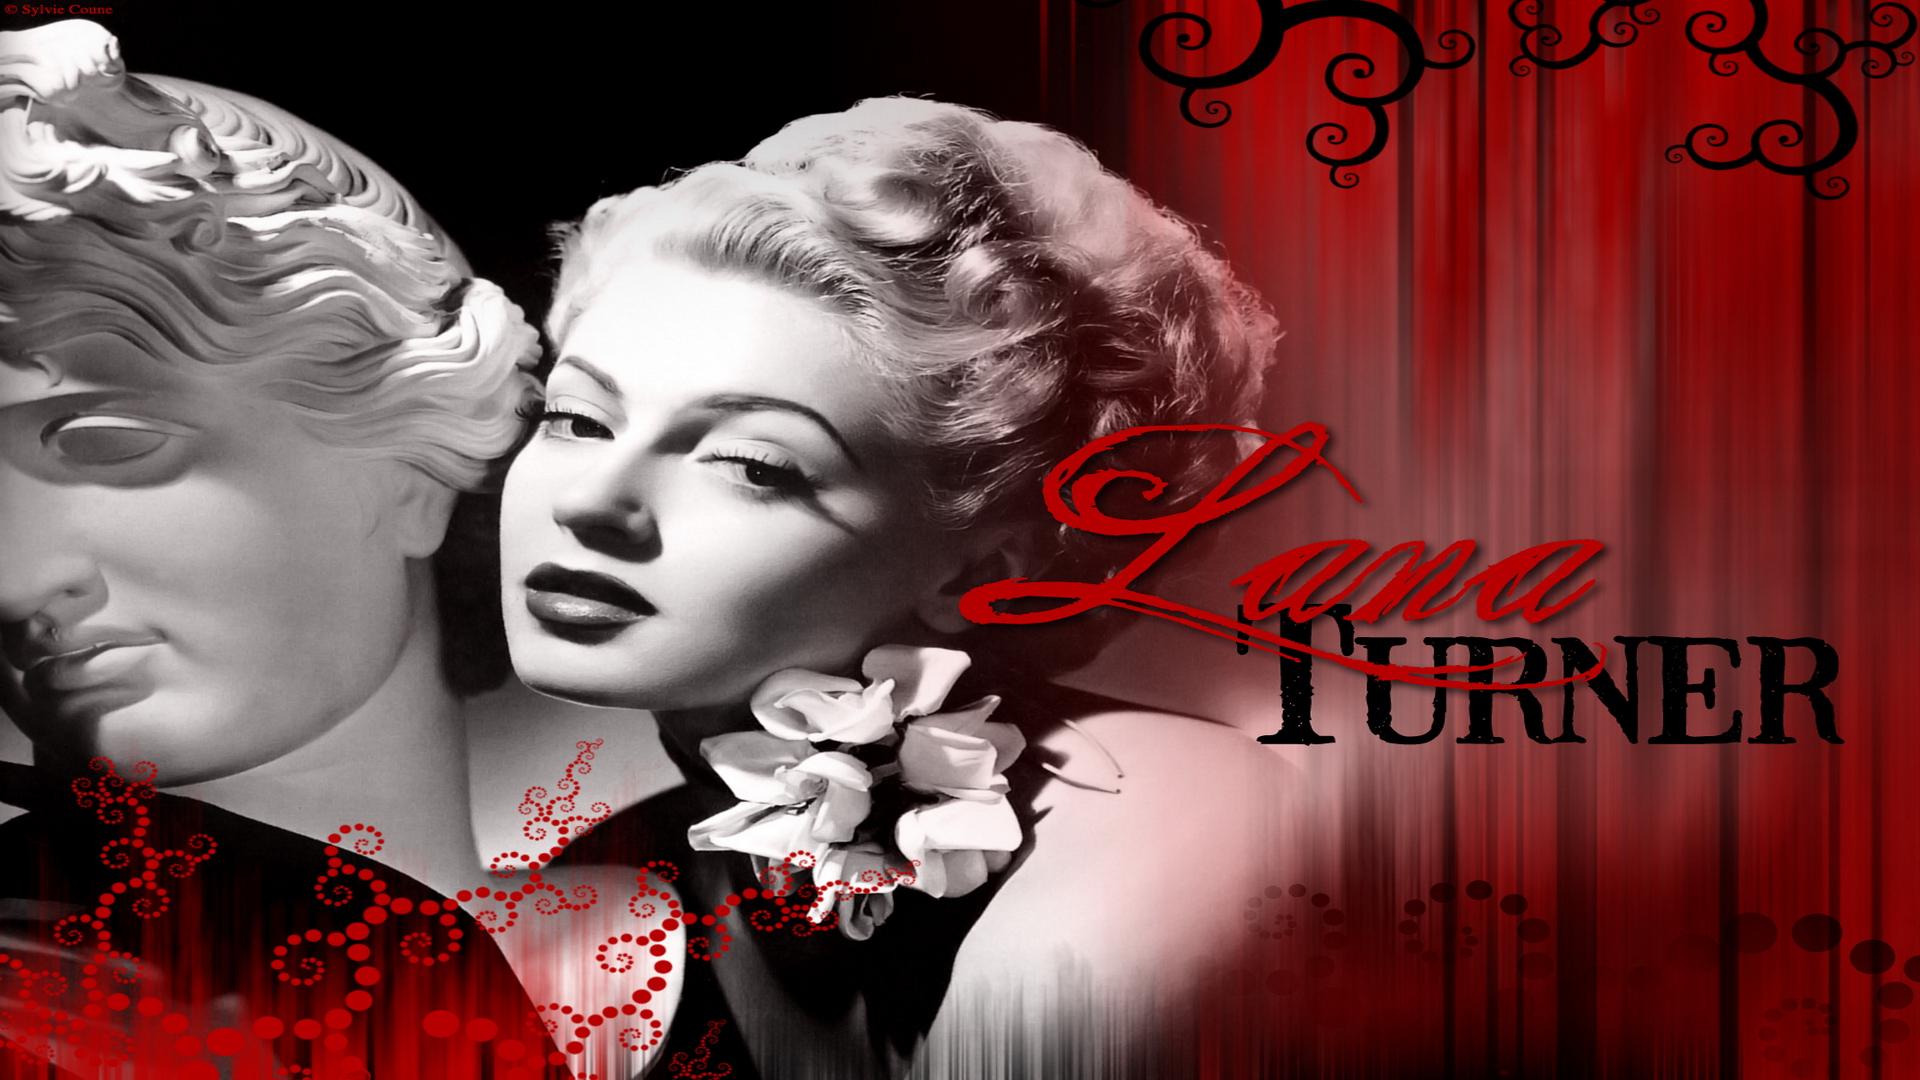 Wallpaper Lana Turner classic movies 9893673jpg Classic Movie 1920x1080